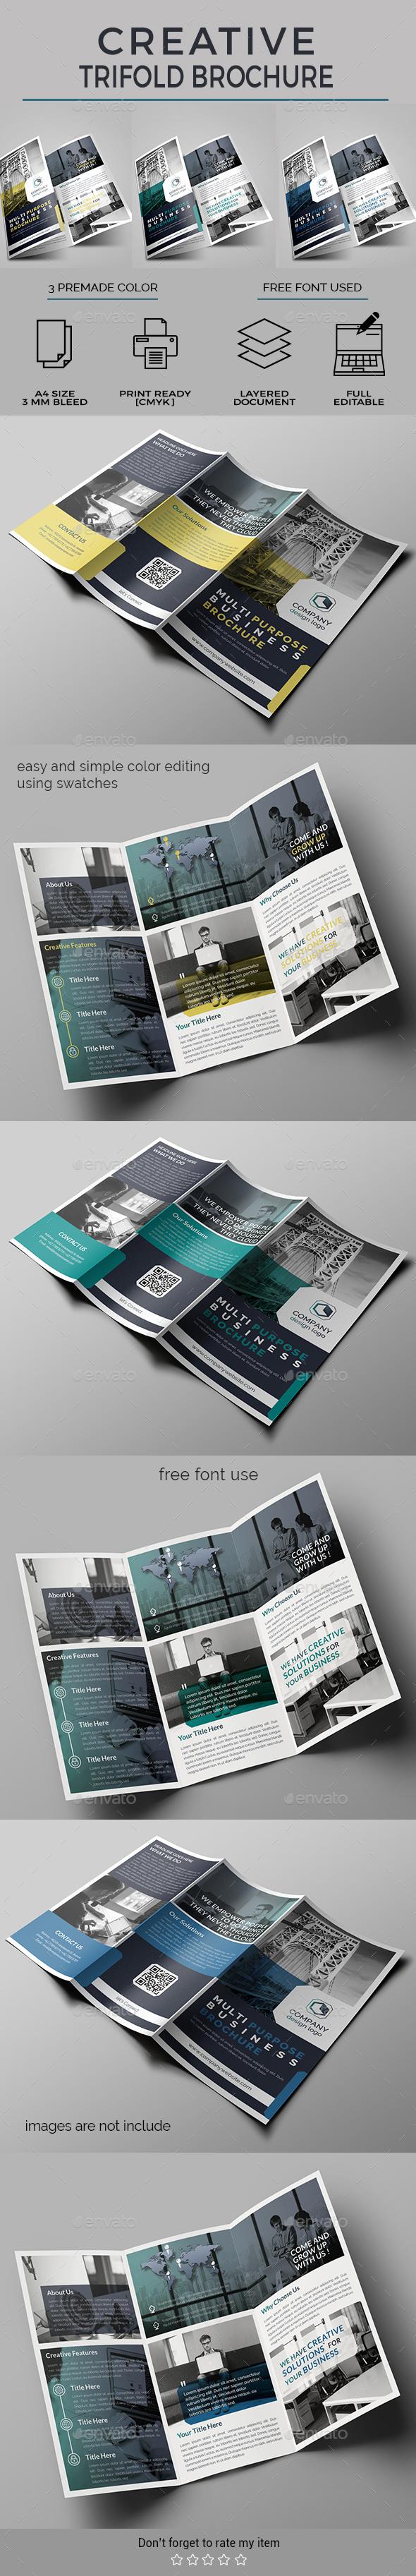 GraphicRiver Trifold Brochure 20679425